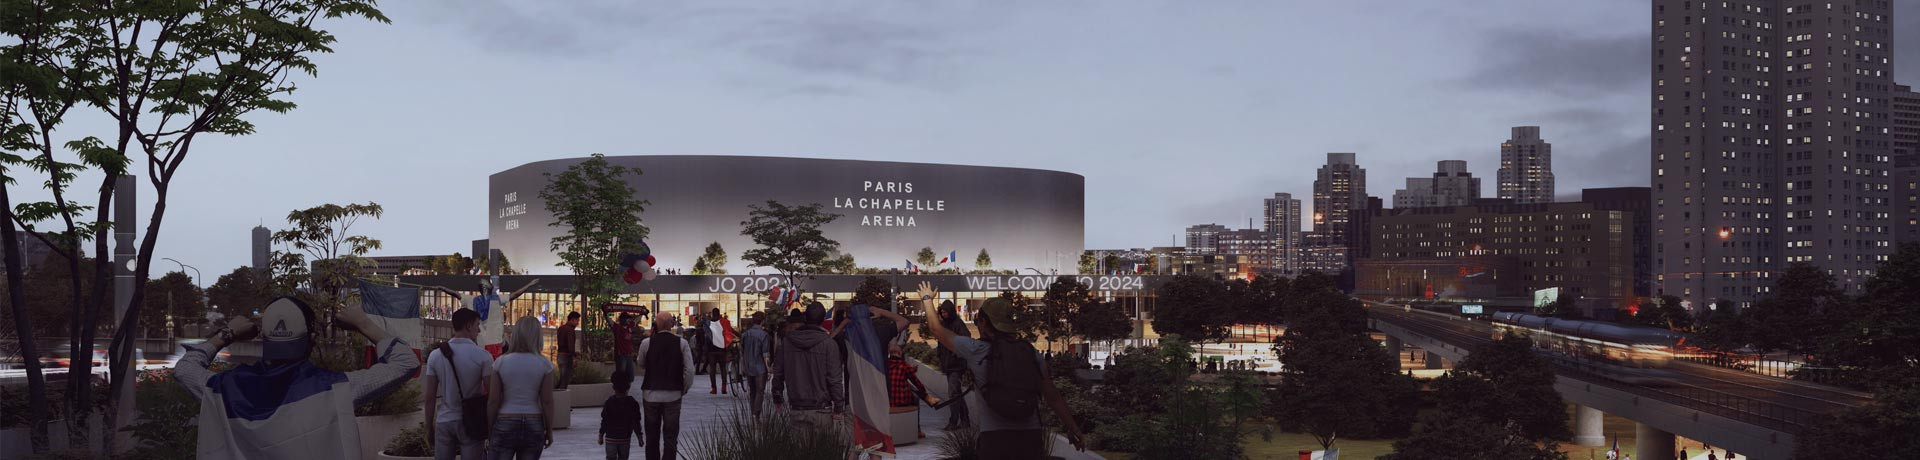 Projet Arena 2 JO 2024